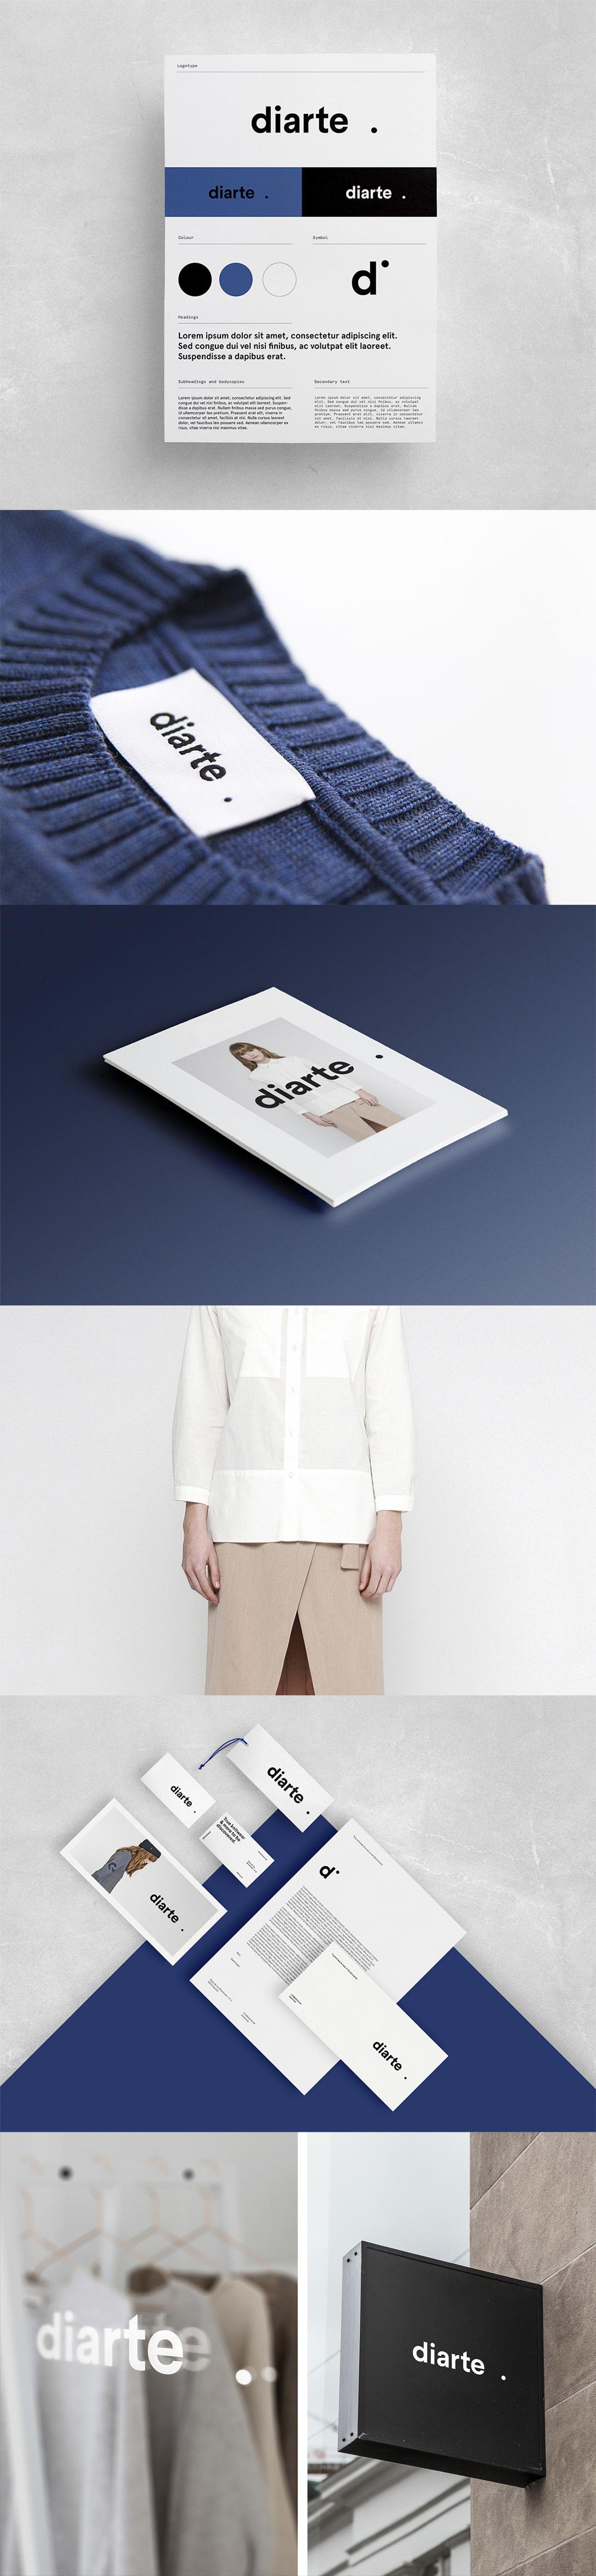 Diarte visual identity by Rebeka Arce - Creative Work